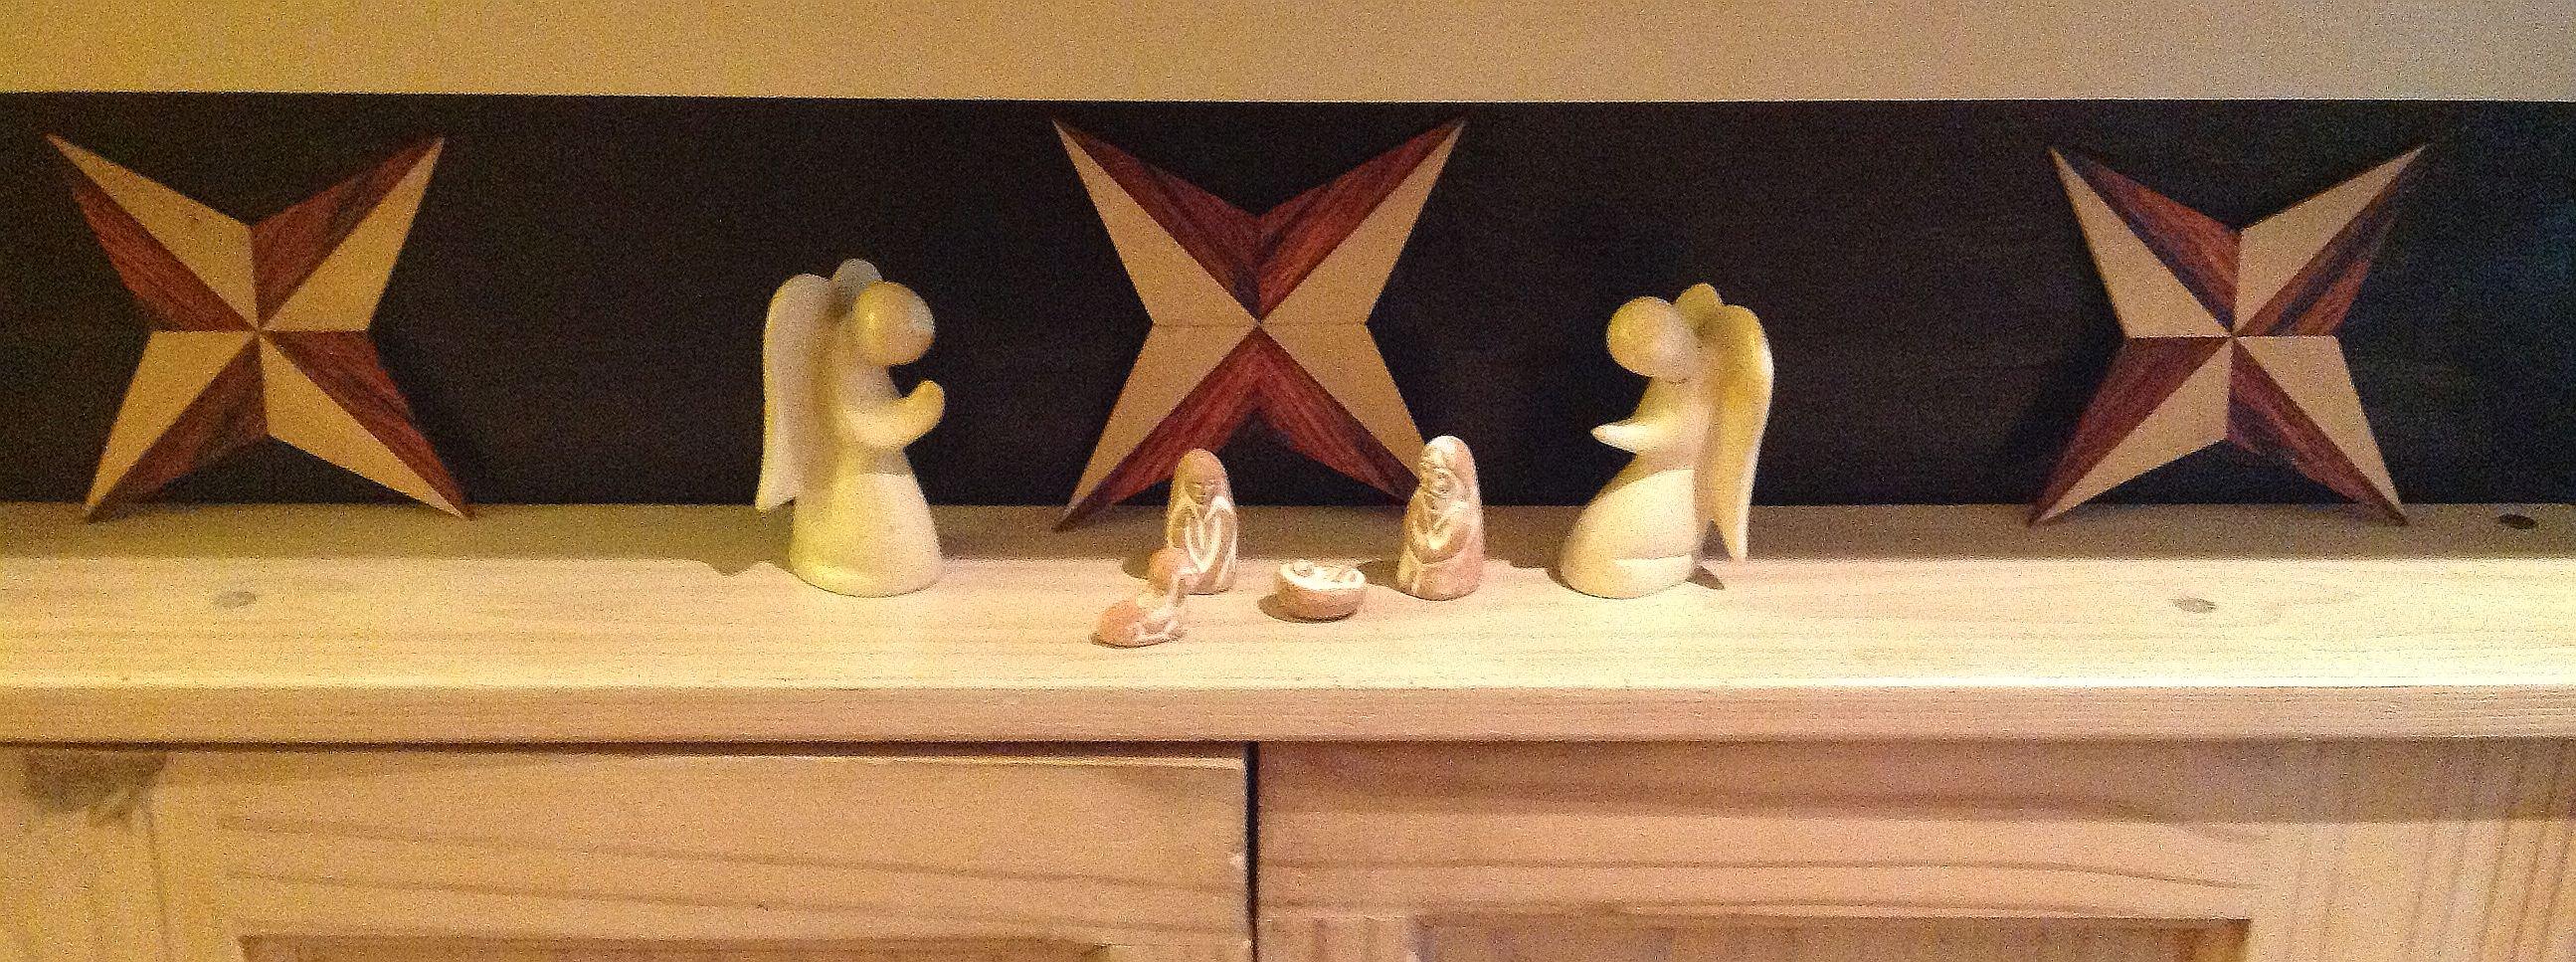 Christmas Stars by Jon Place